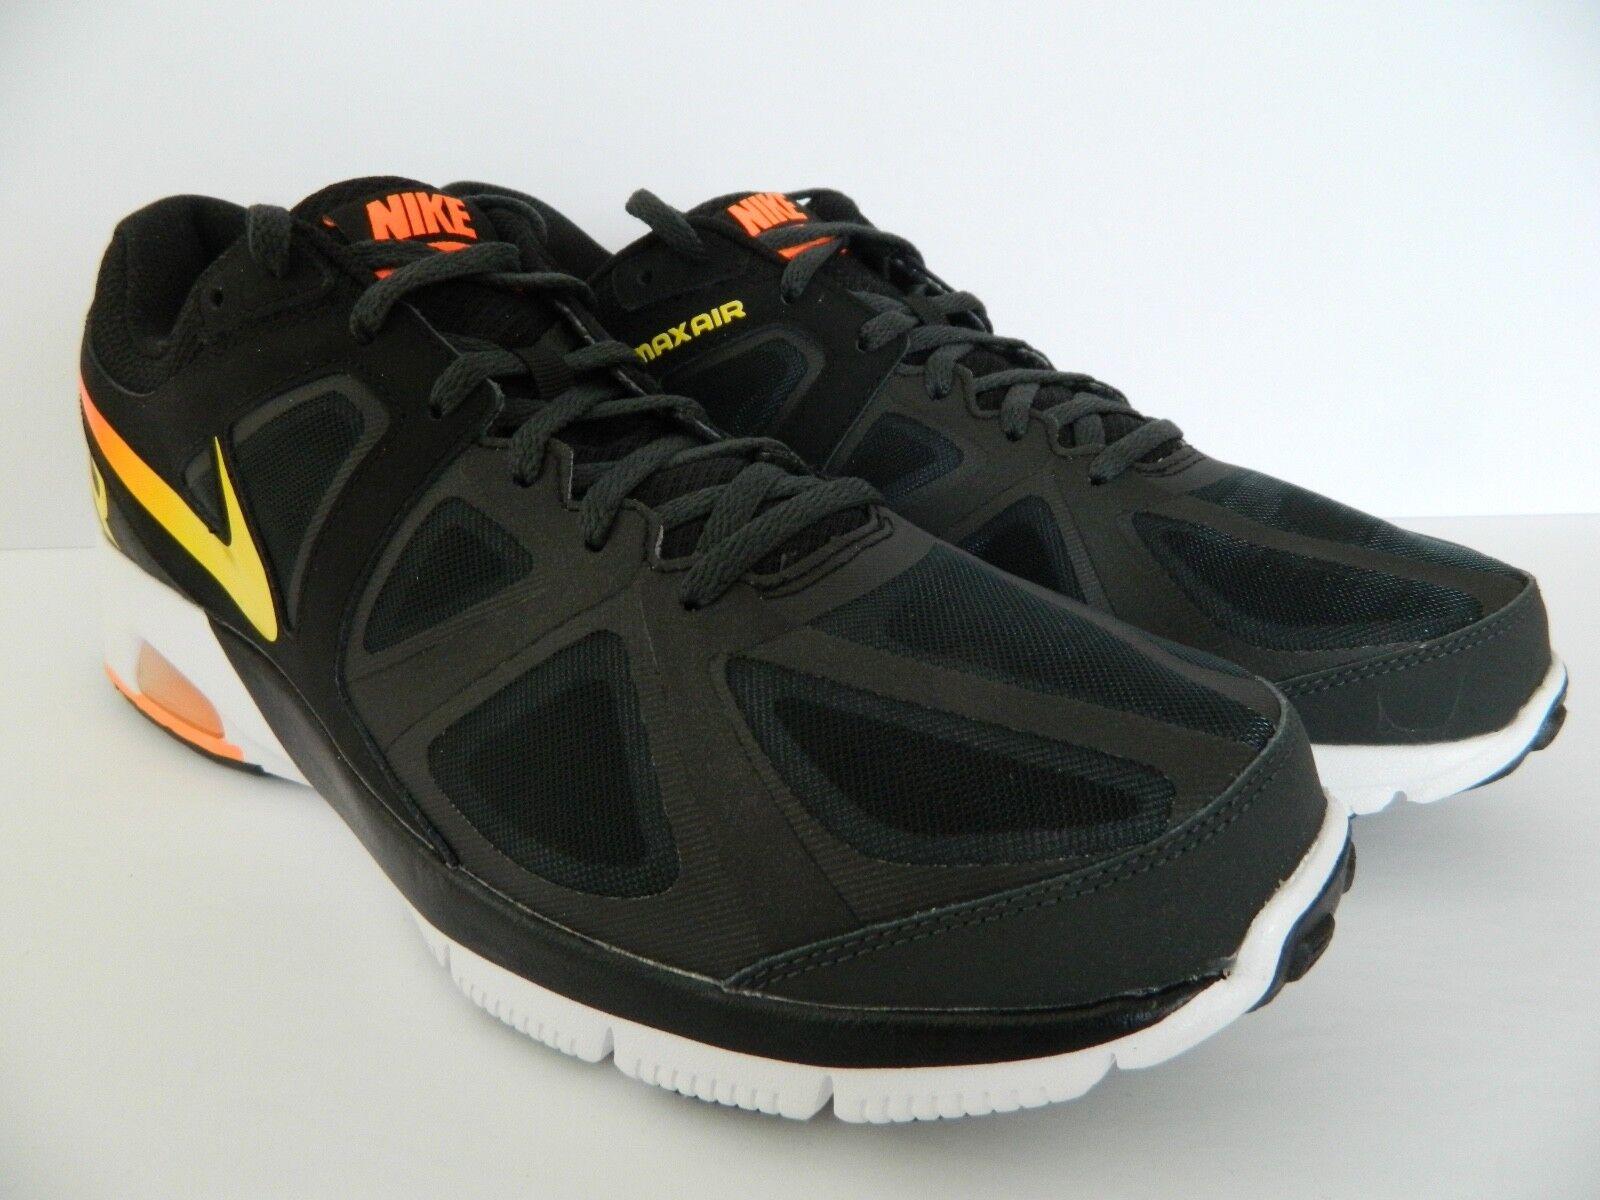 Nike Air Max Run Lite 4 (negro / orng) TR yllw anthricte TTL orng) / (5549006) NIB b724b9